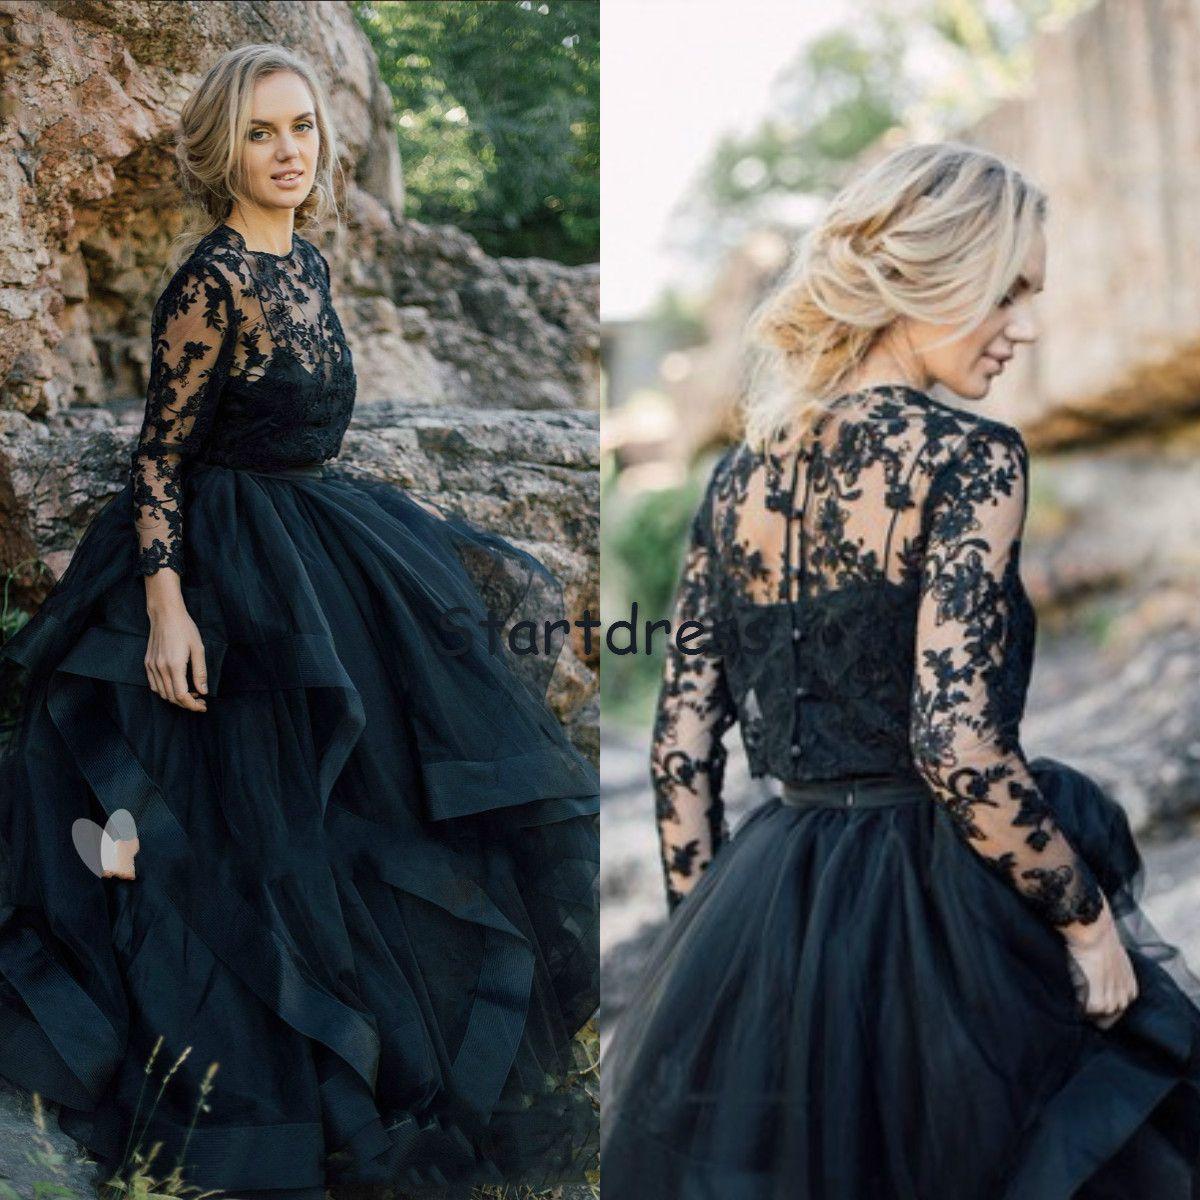 Black Lace Wedding Dress Plus Size Naf Dresses: Großhandel Prinzessin Illusion Top Spitze Schwarz Gothic